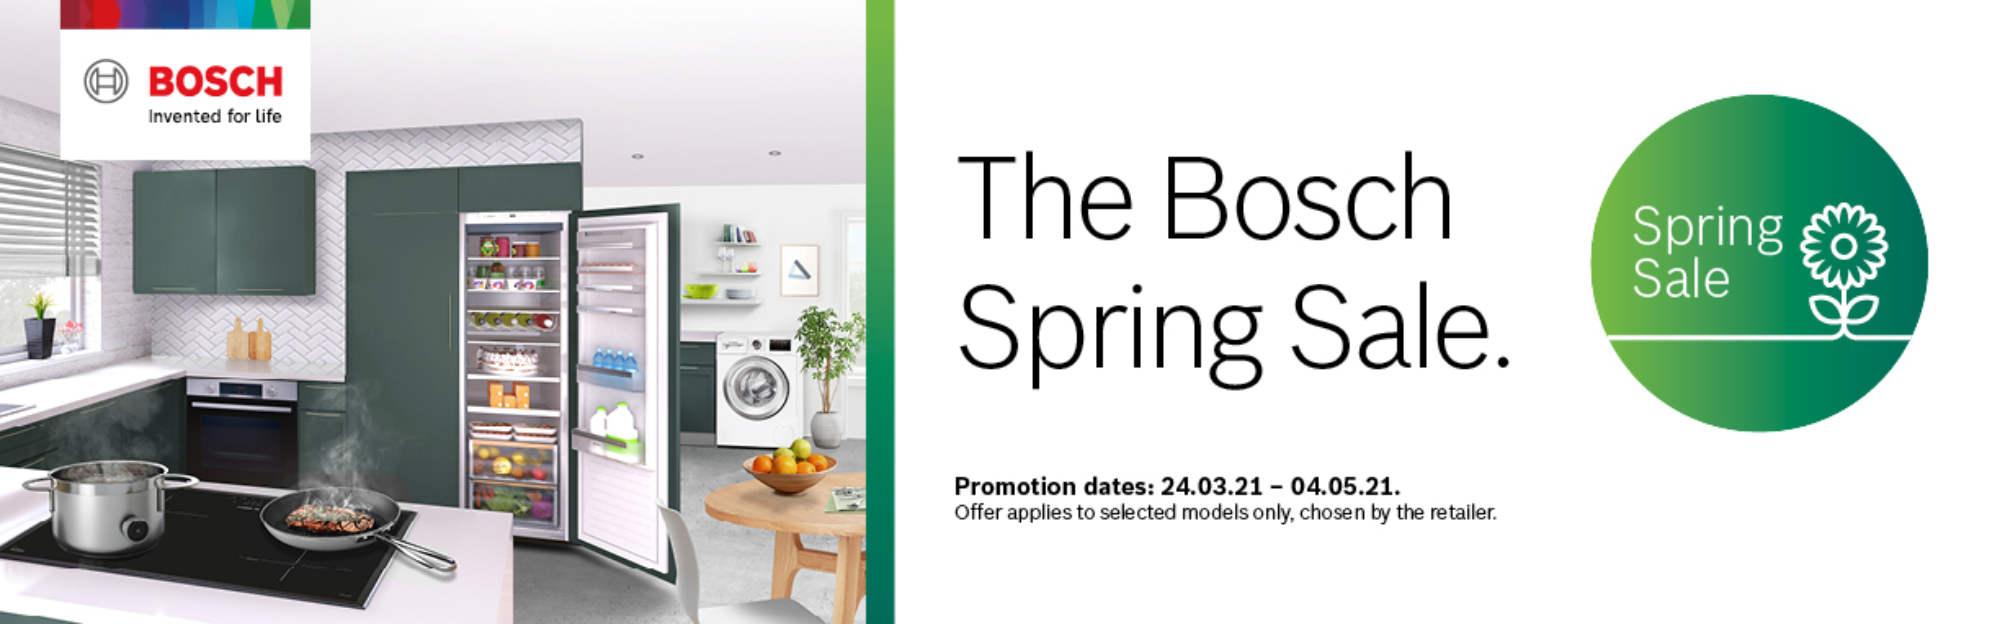 BOSCH Spring 2021 Promotion